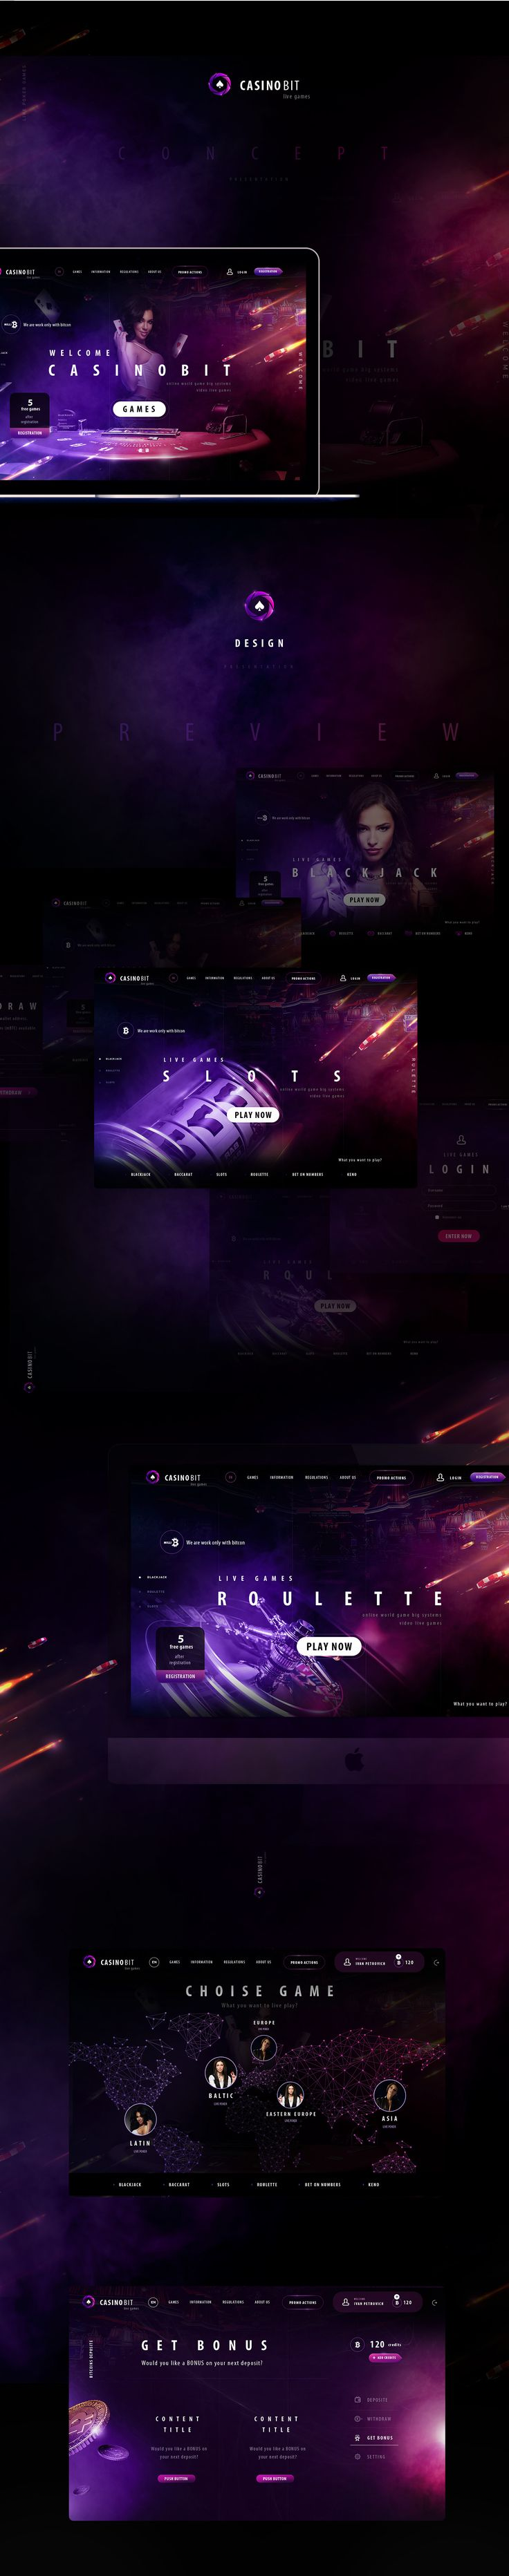 Online Casino Web-design